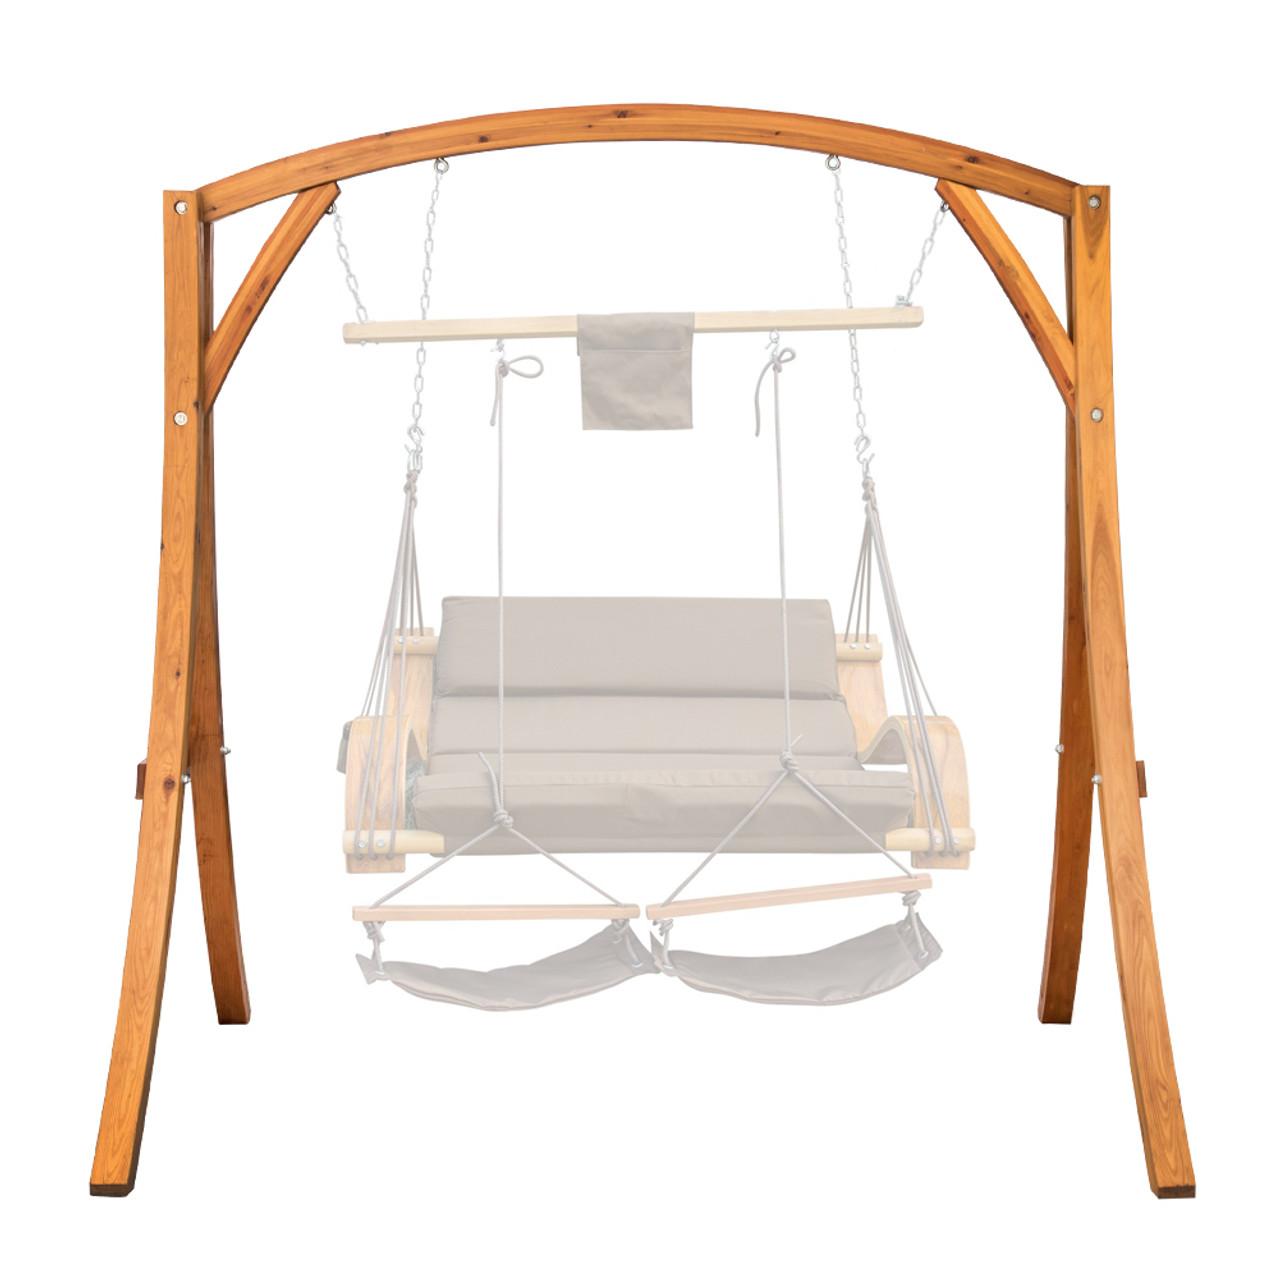 swing chair in stand electric lift chairs lazy daze hammocks deluxe wooden arc frame hammock heavy duty russian pine hardwood